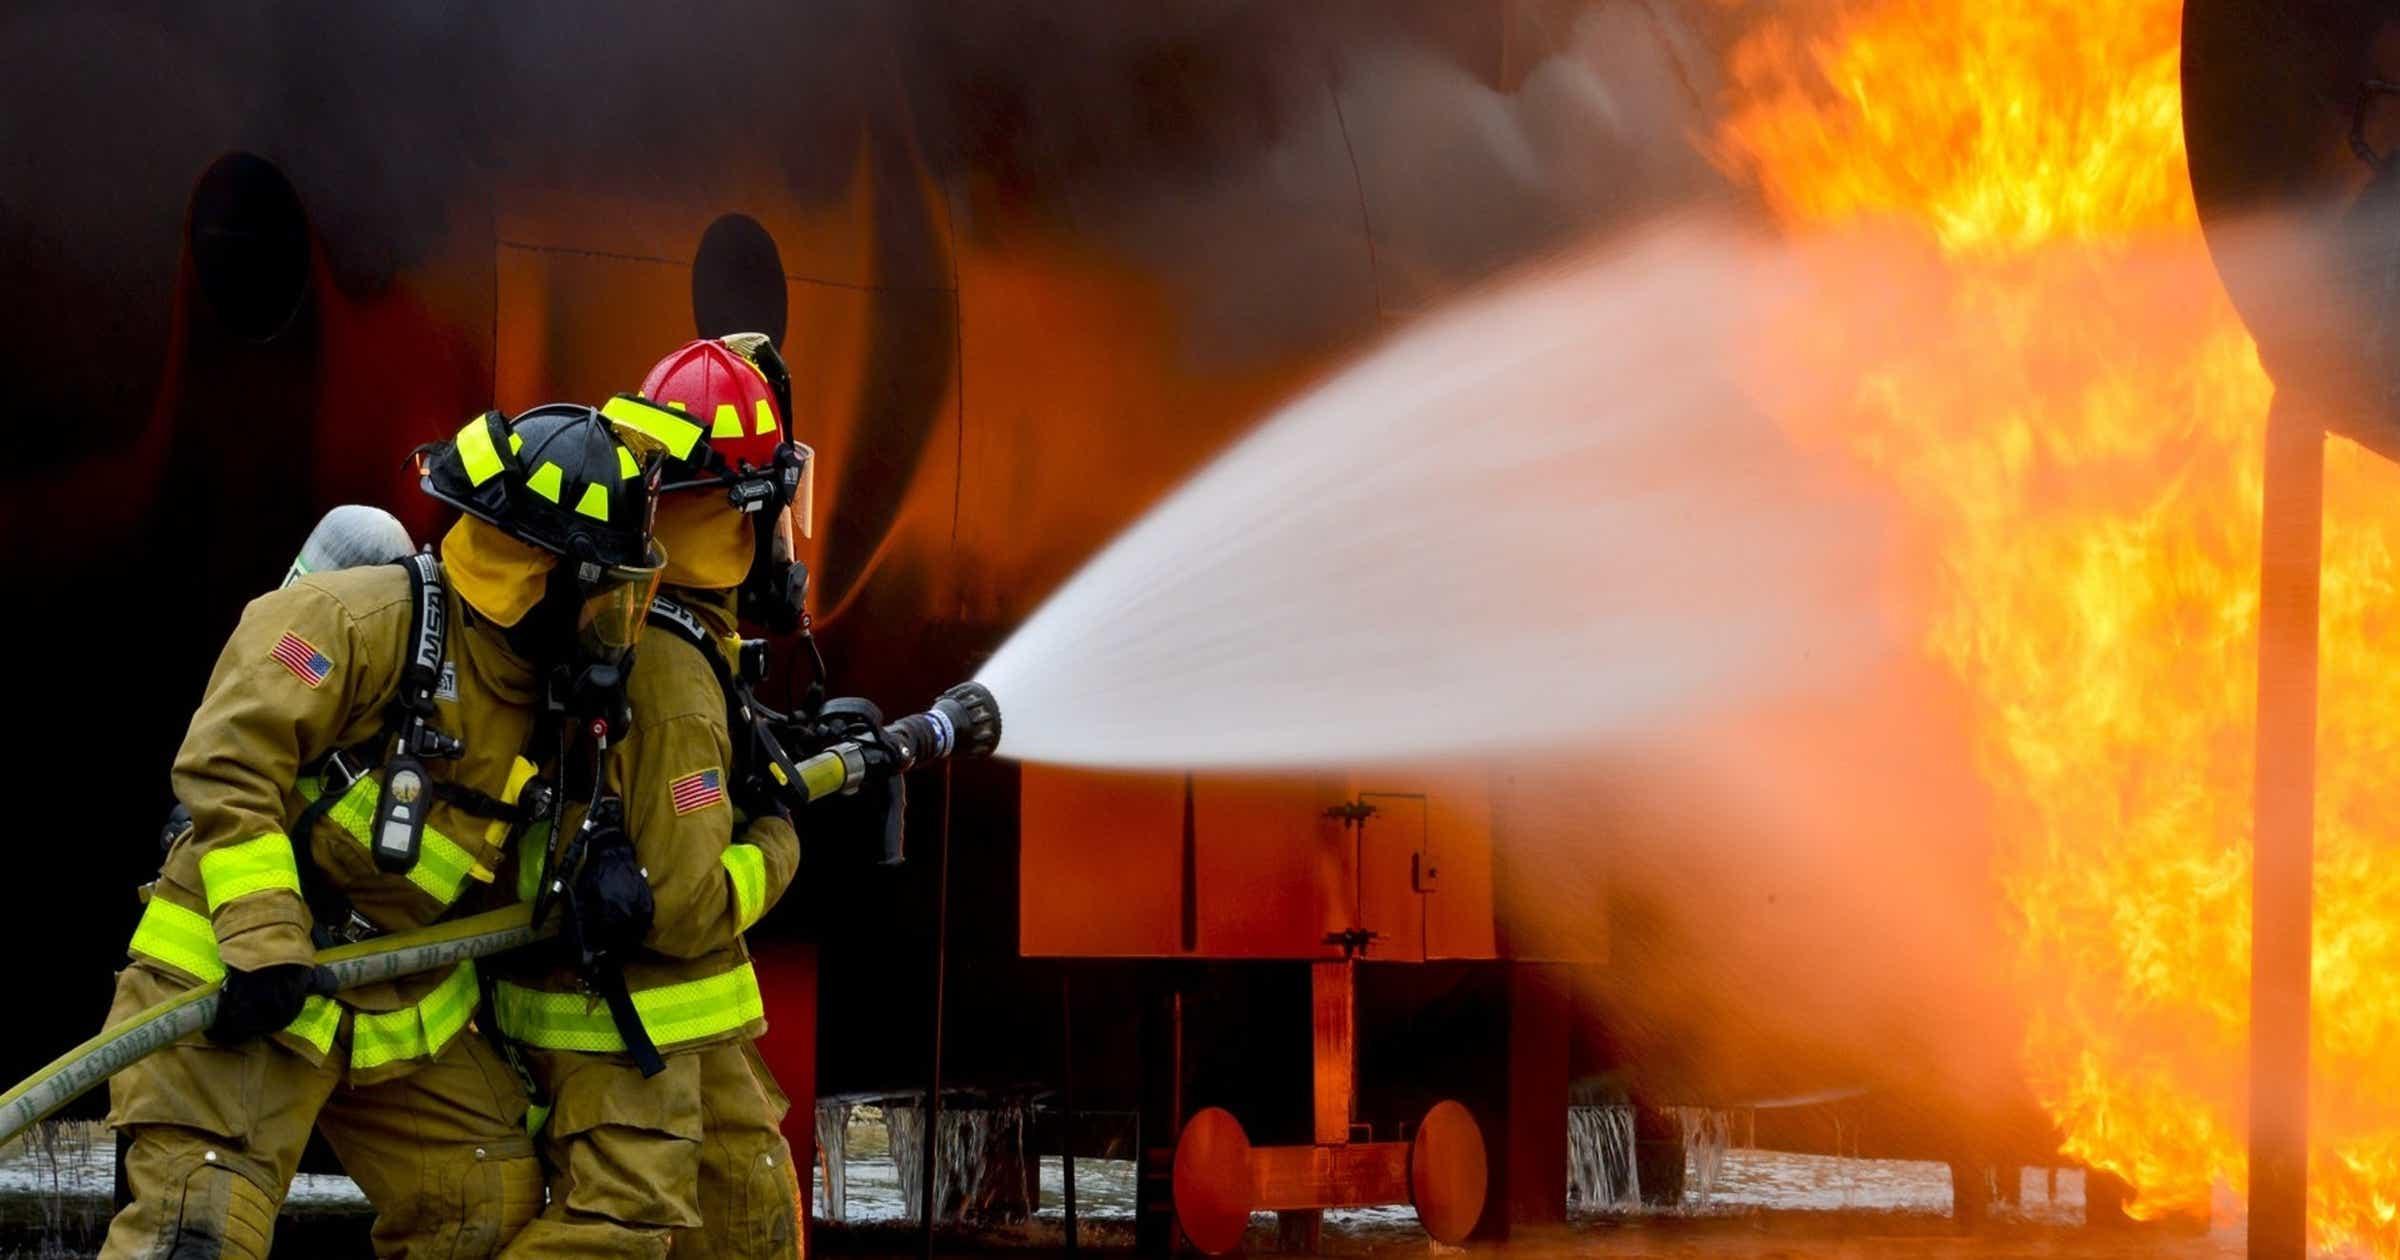 Firefighter Job Description